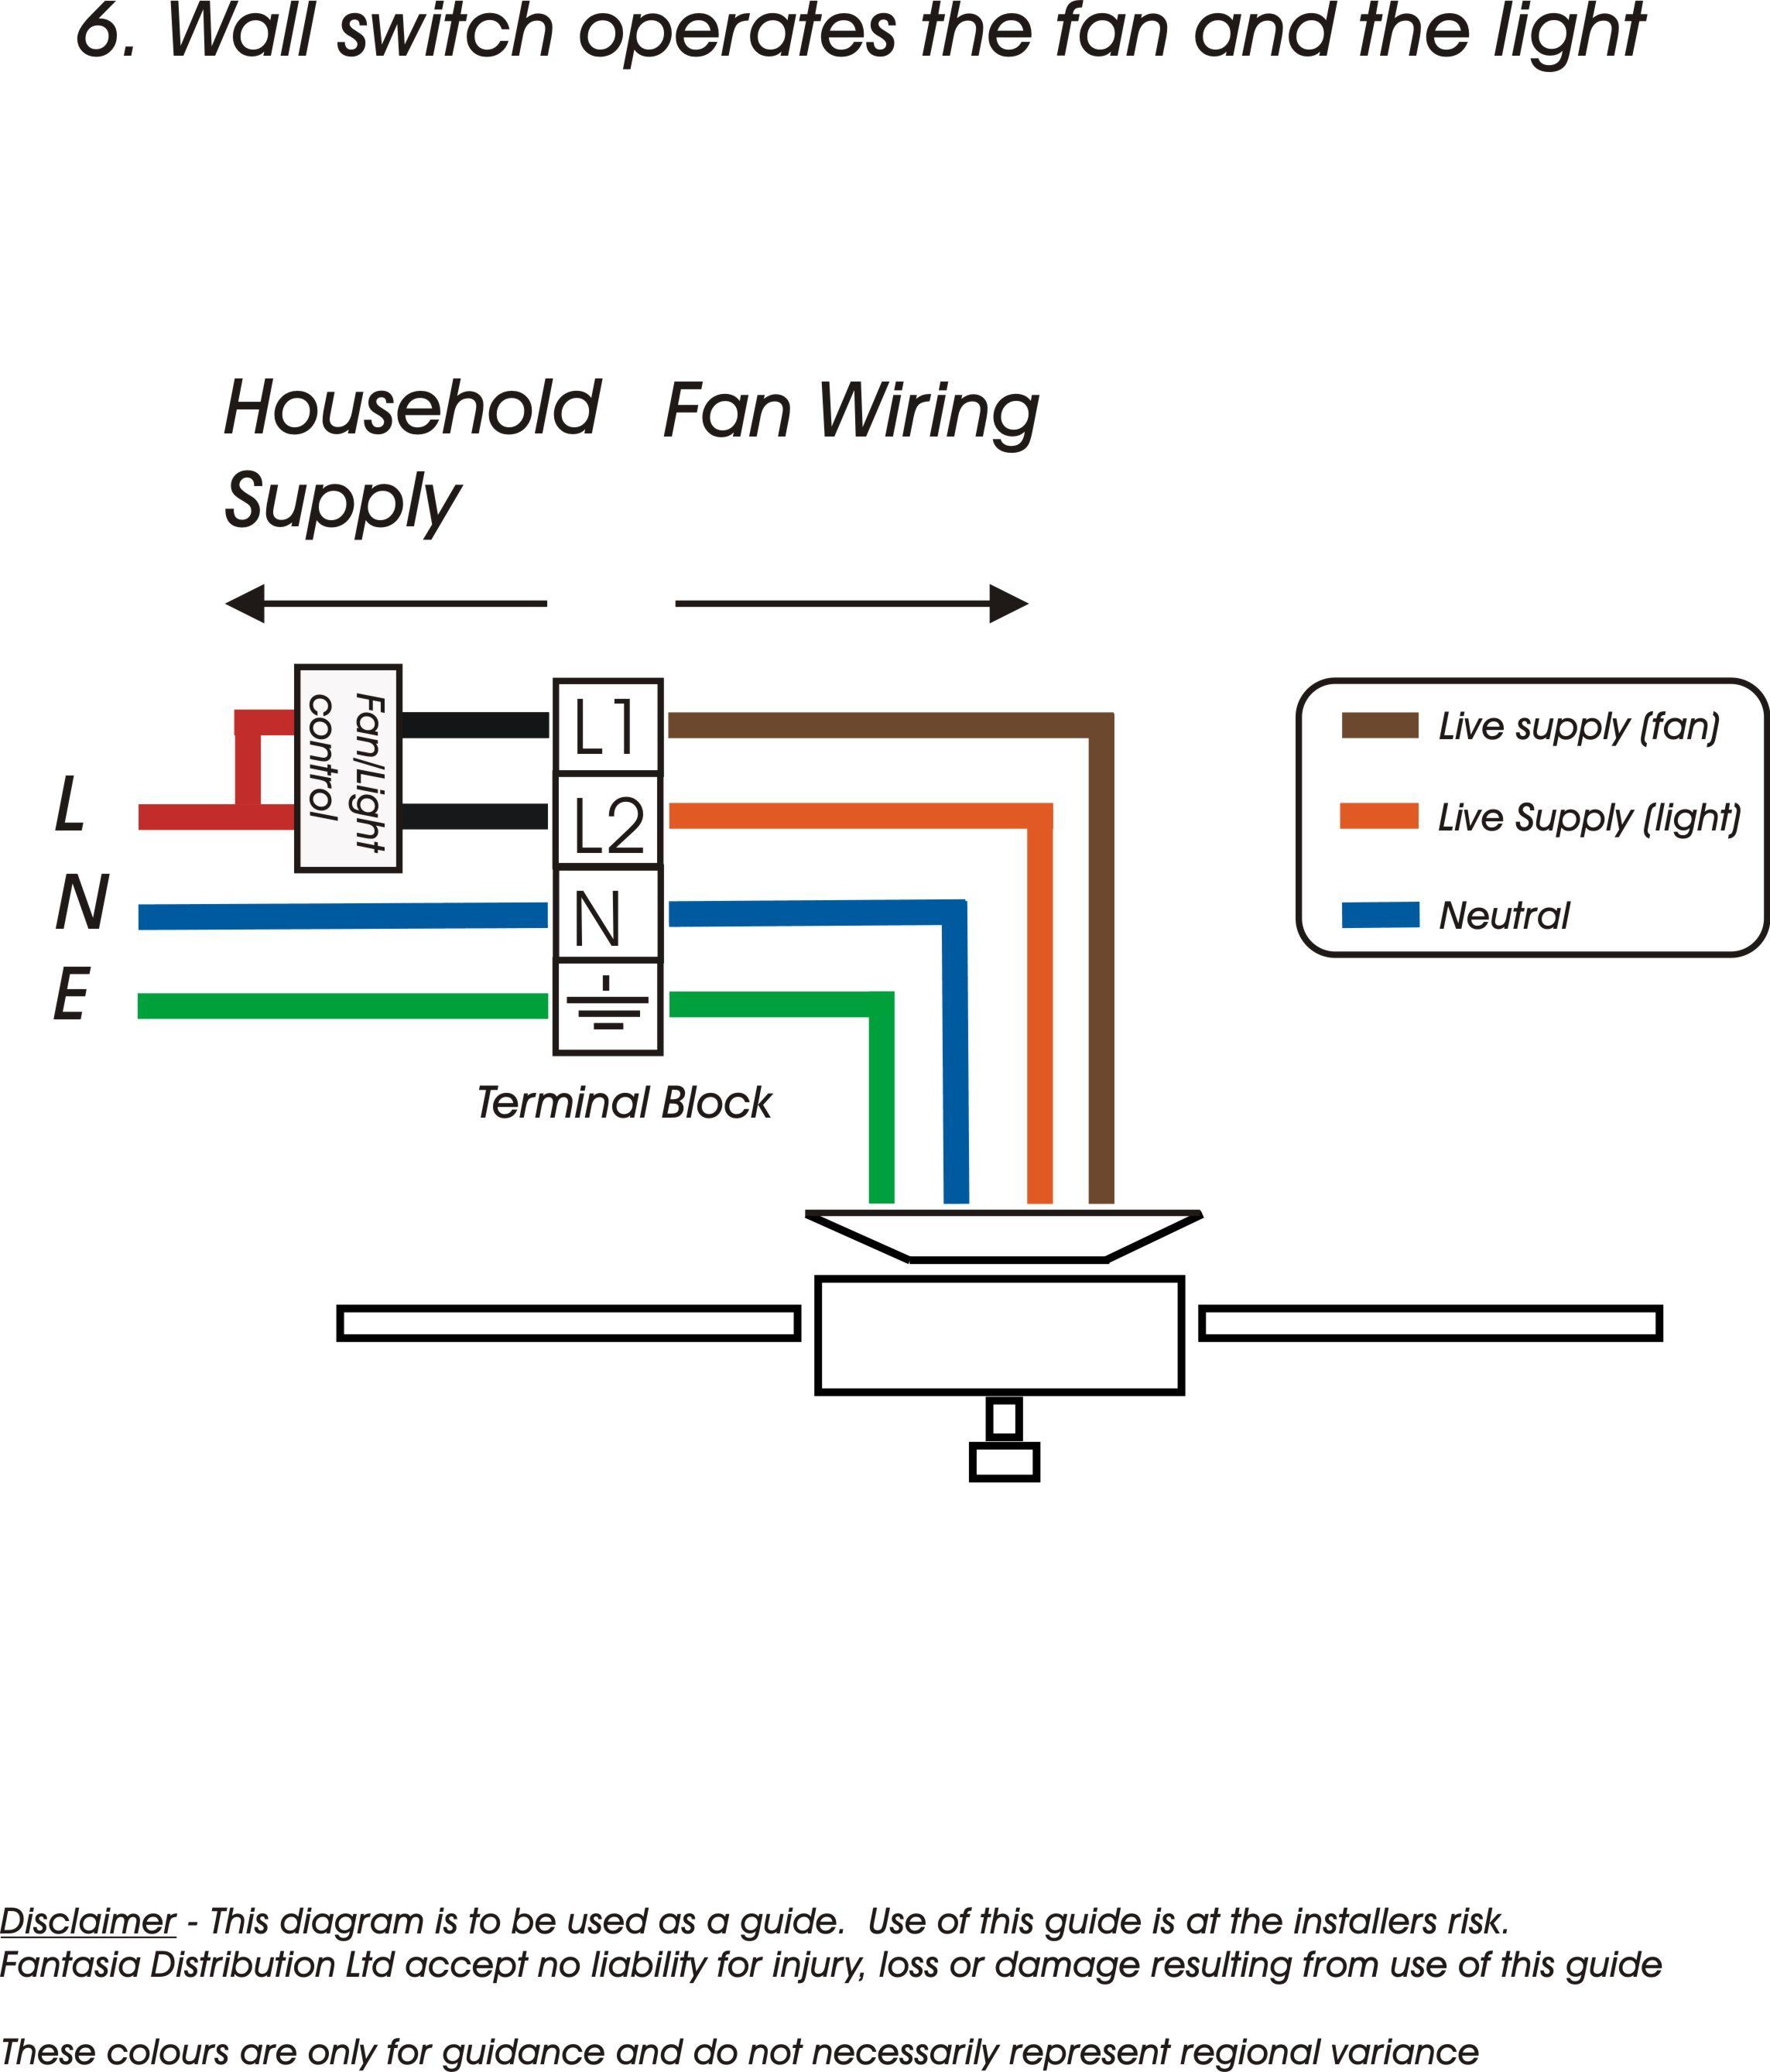 Electric Fan Diagram Standard Electric Wall Fan - Schema Wiring Diagram - Standard Electric Fan Wiring Diagram